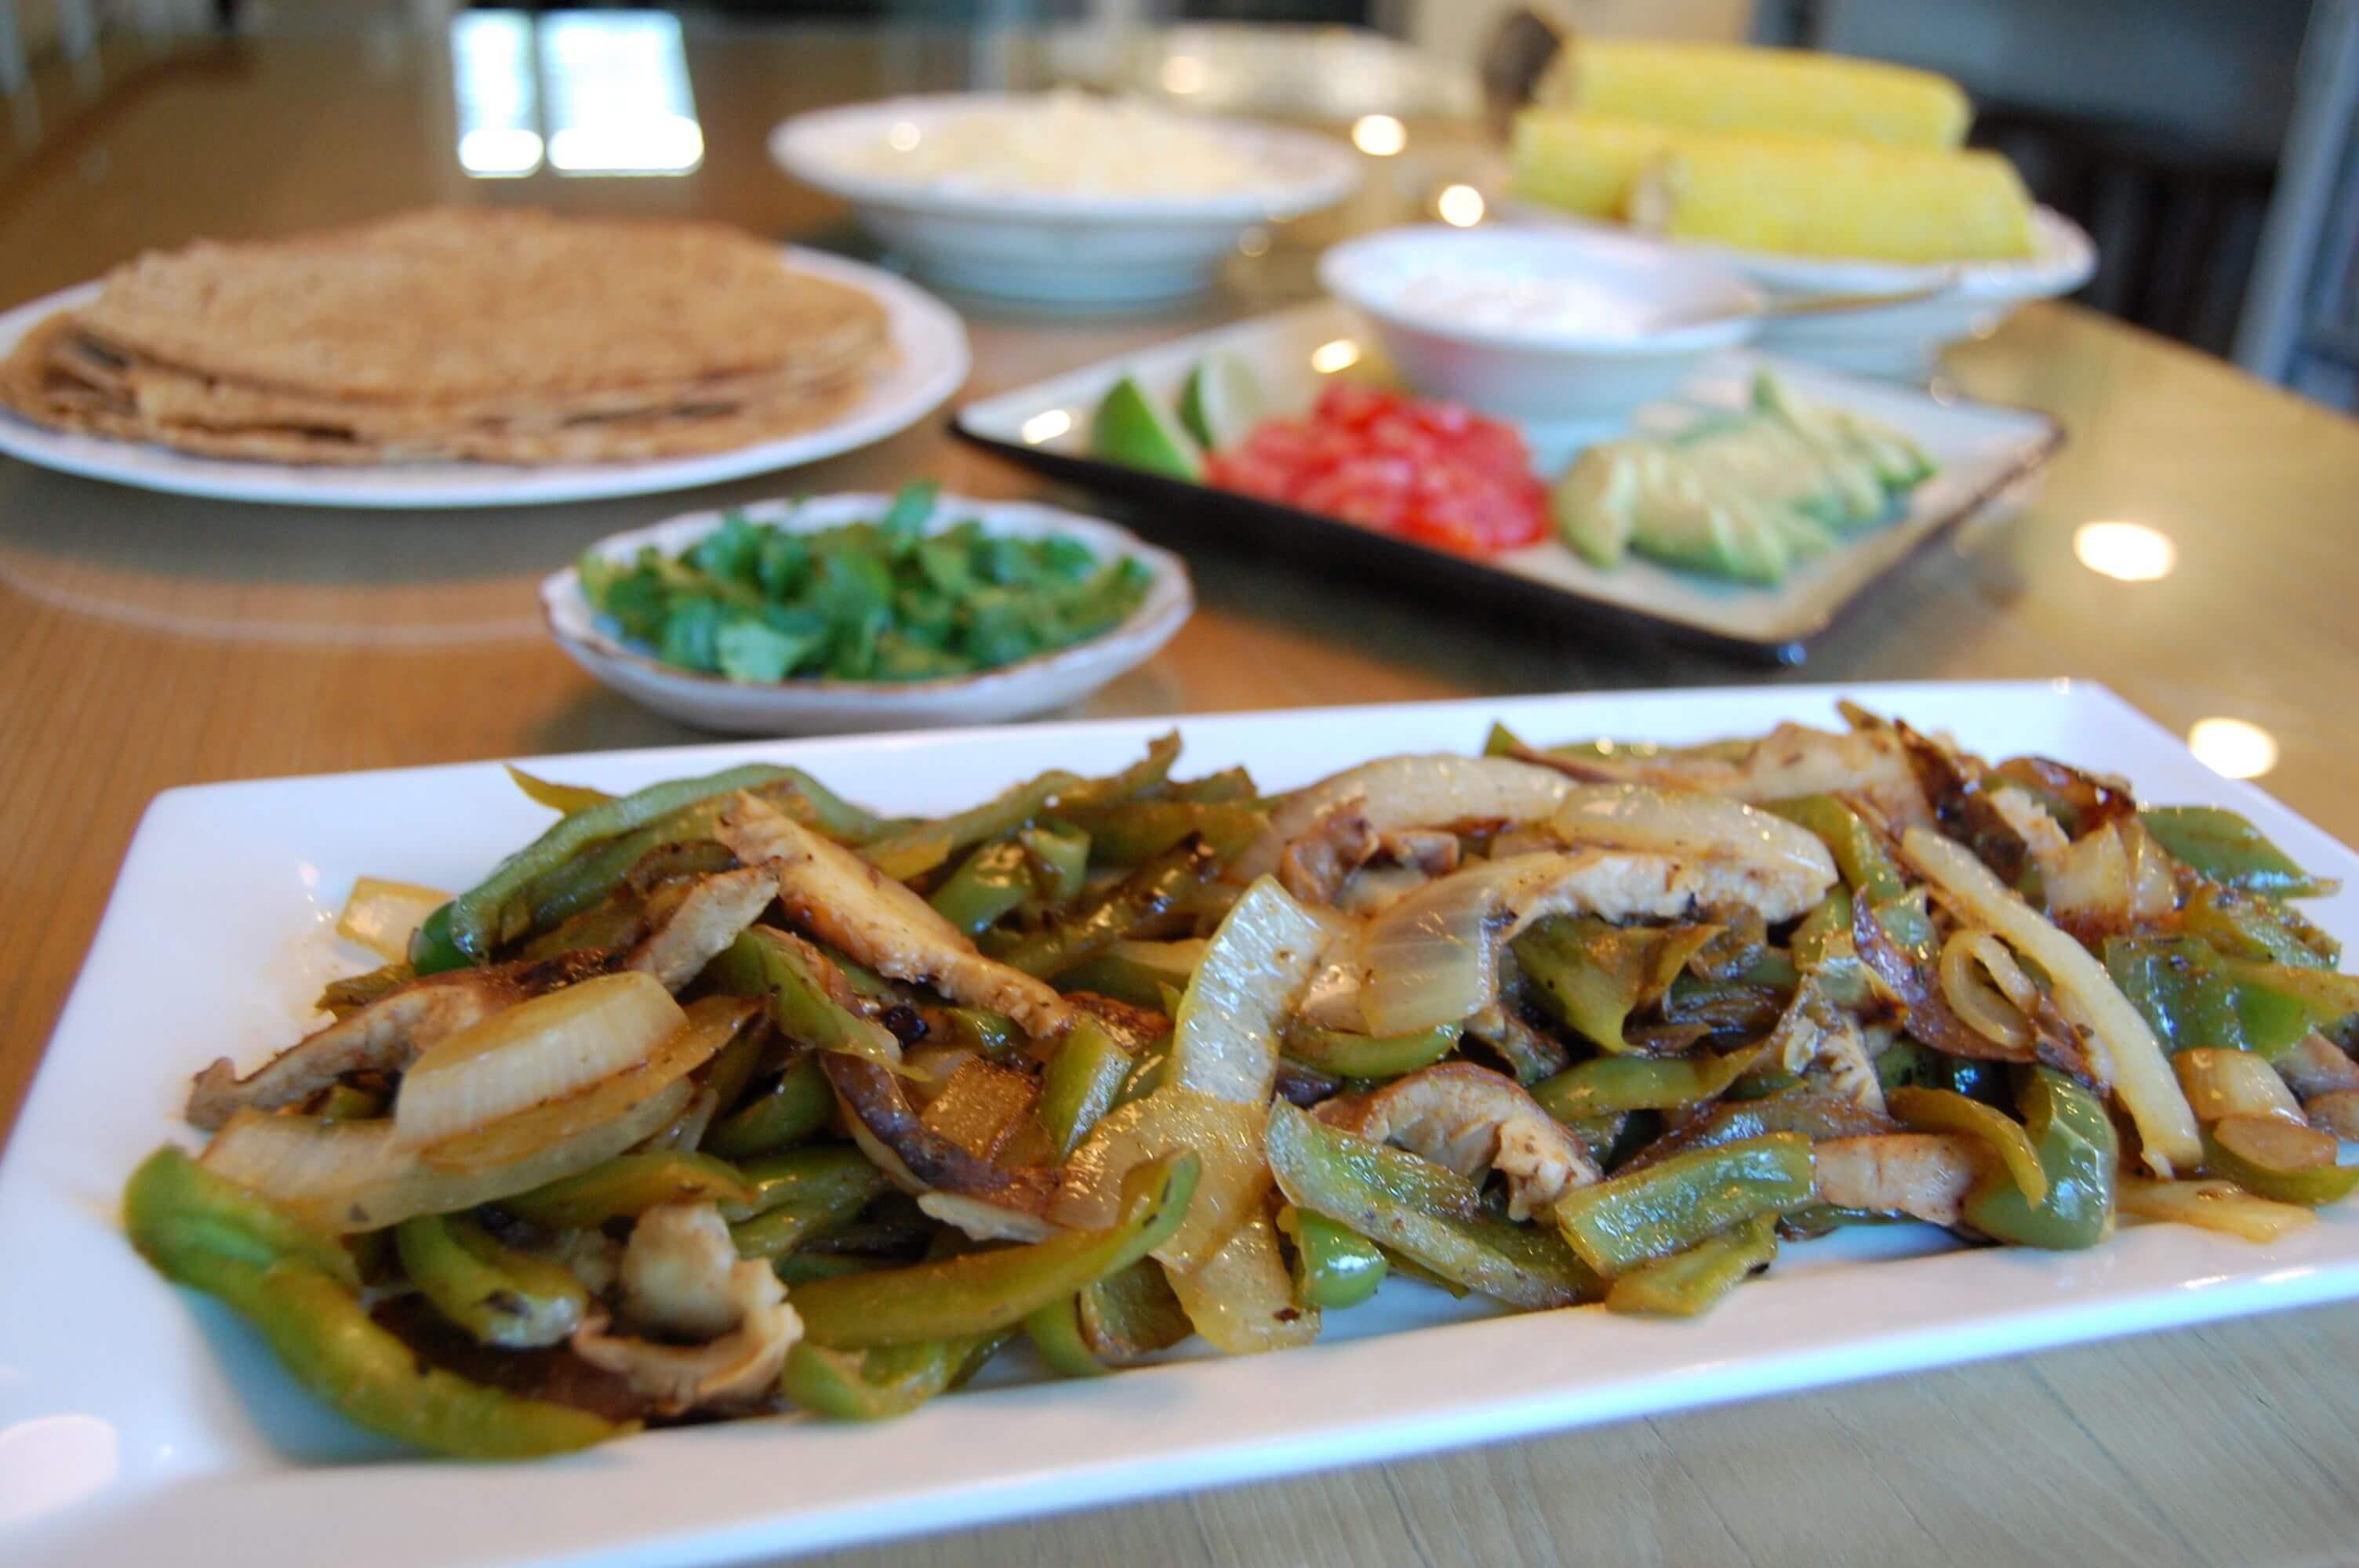 Fajitas from 100 Days of Real Food